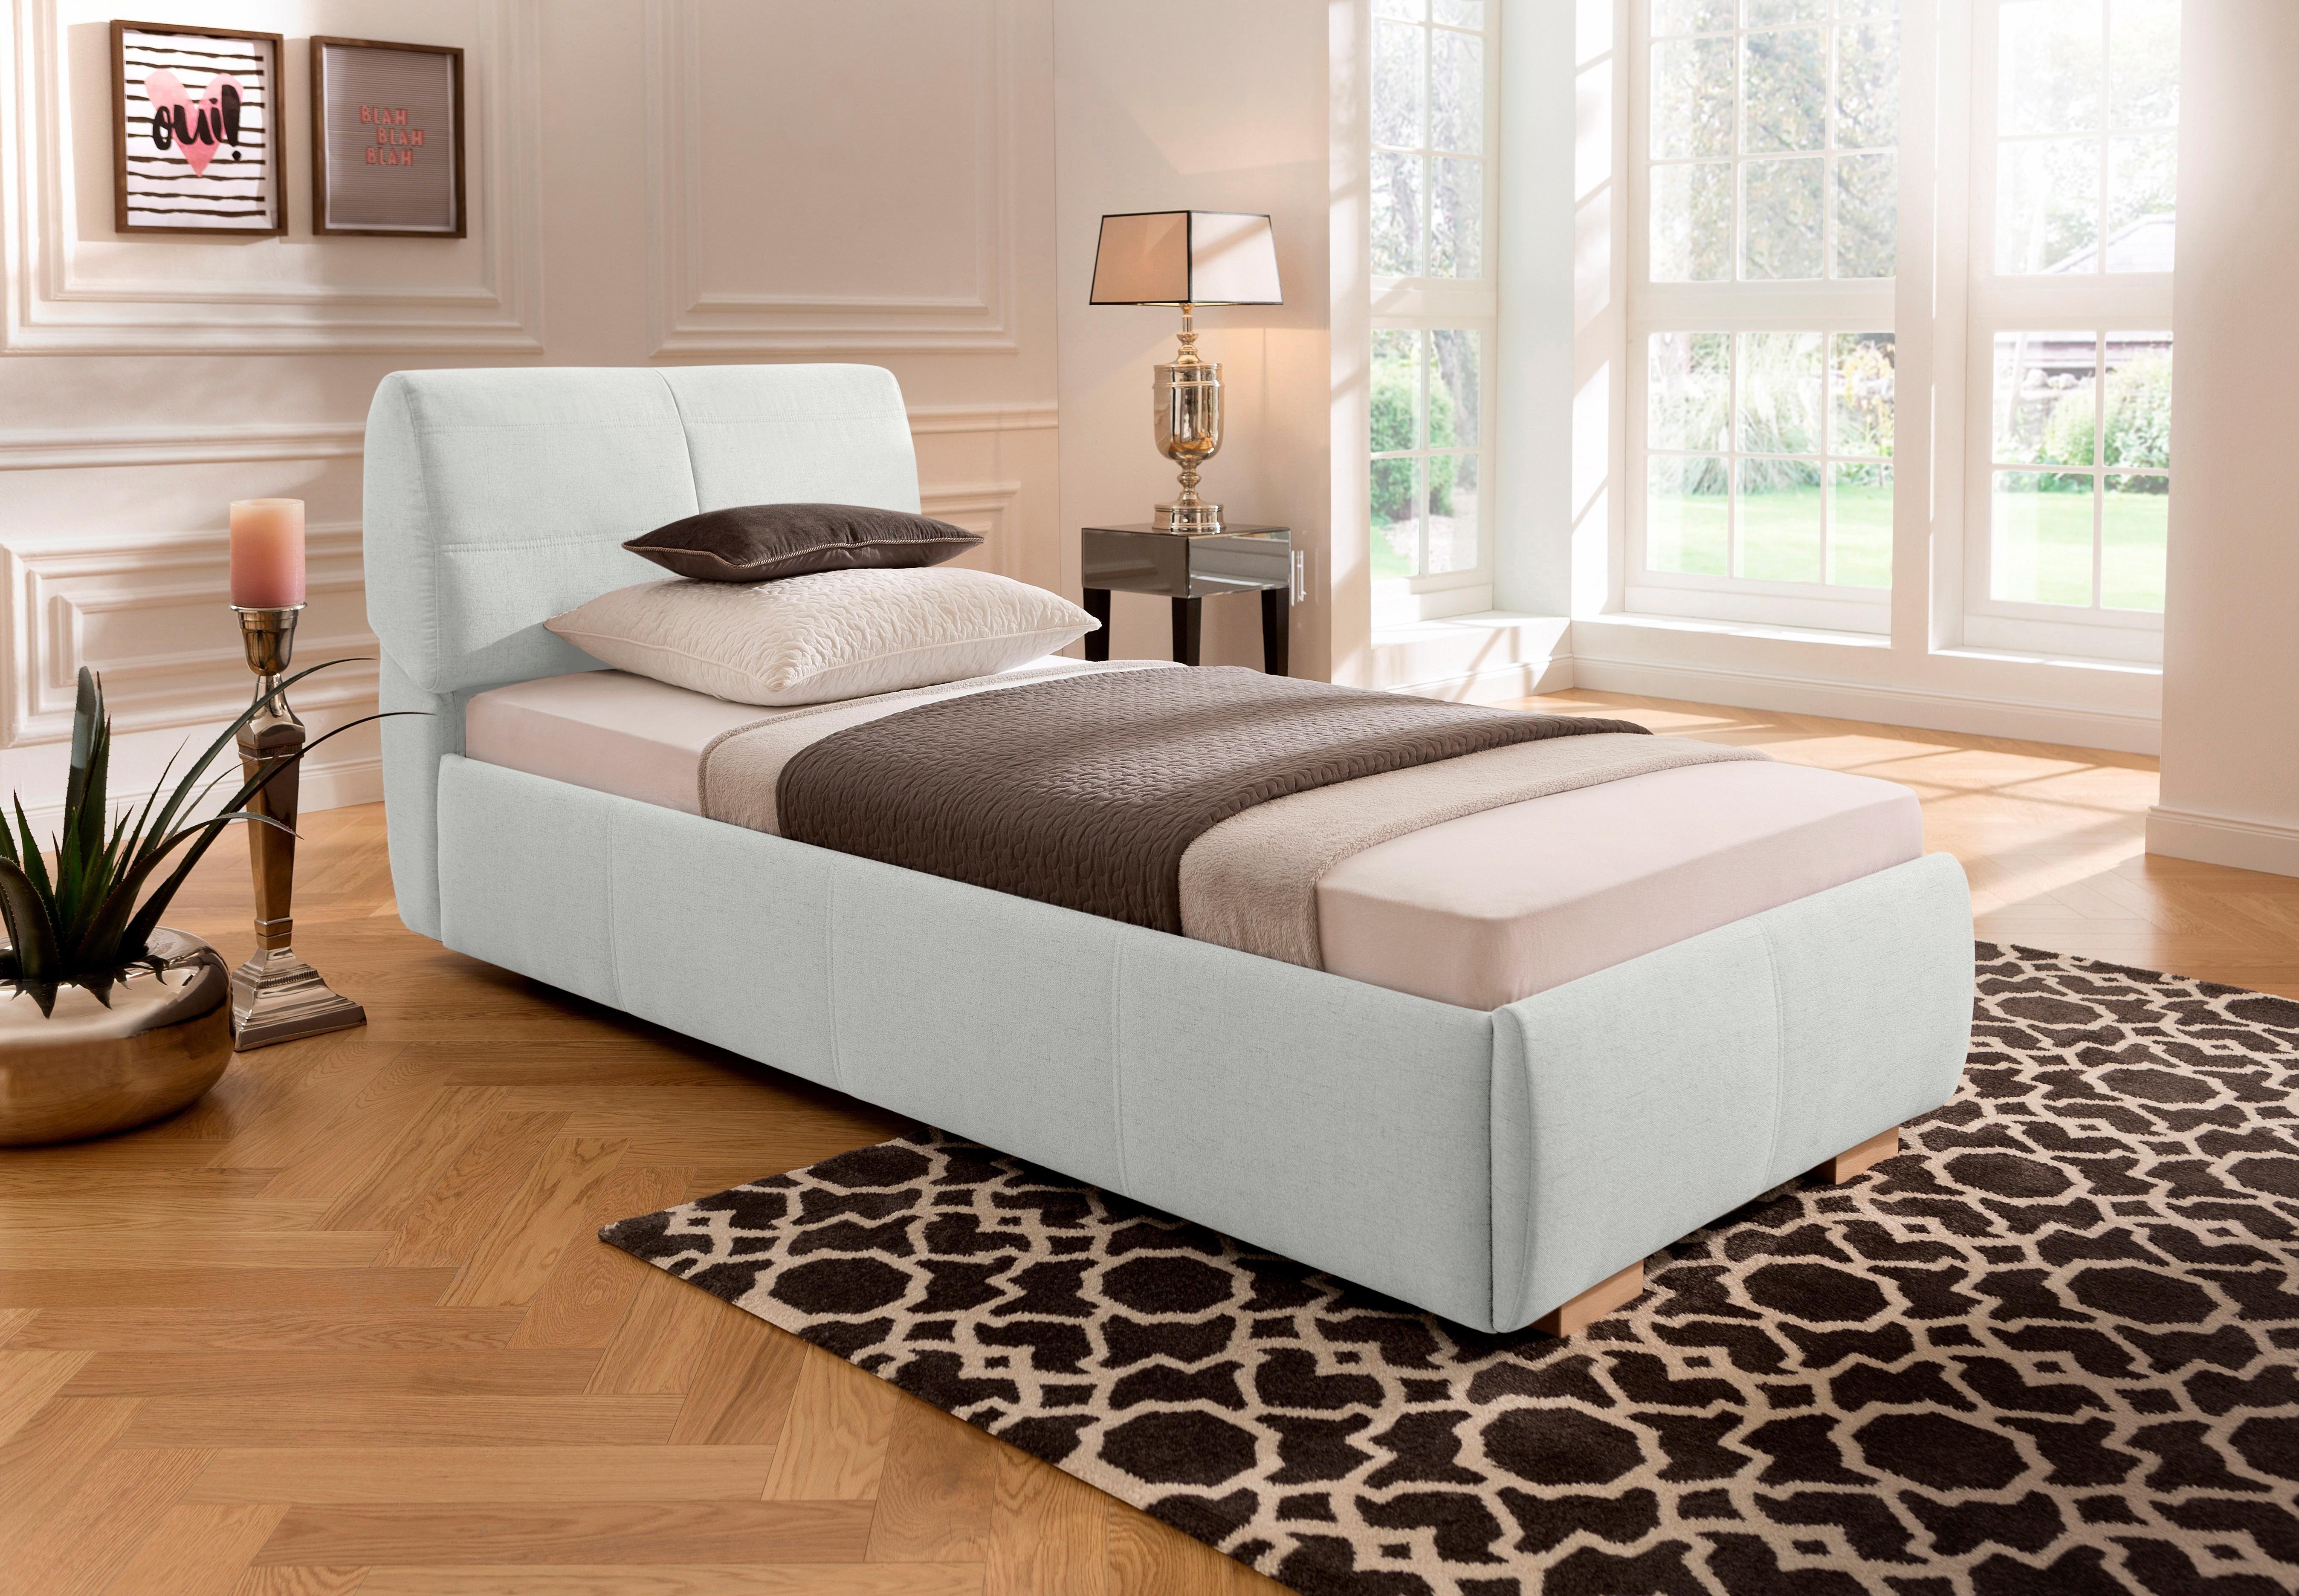 50 sparen home affaire polsterbett solaris nur 349 99 cherry m bel otto. Black Bedroom Furniture Sets. Home Design Ideas